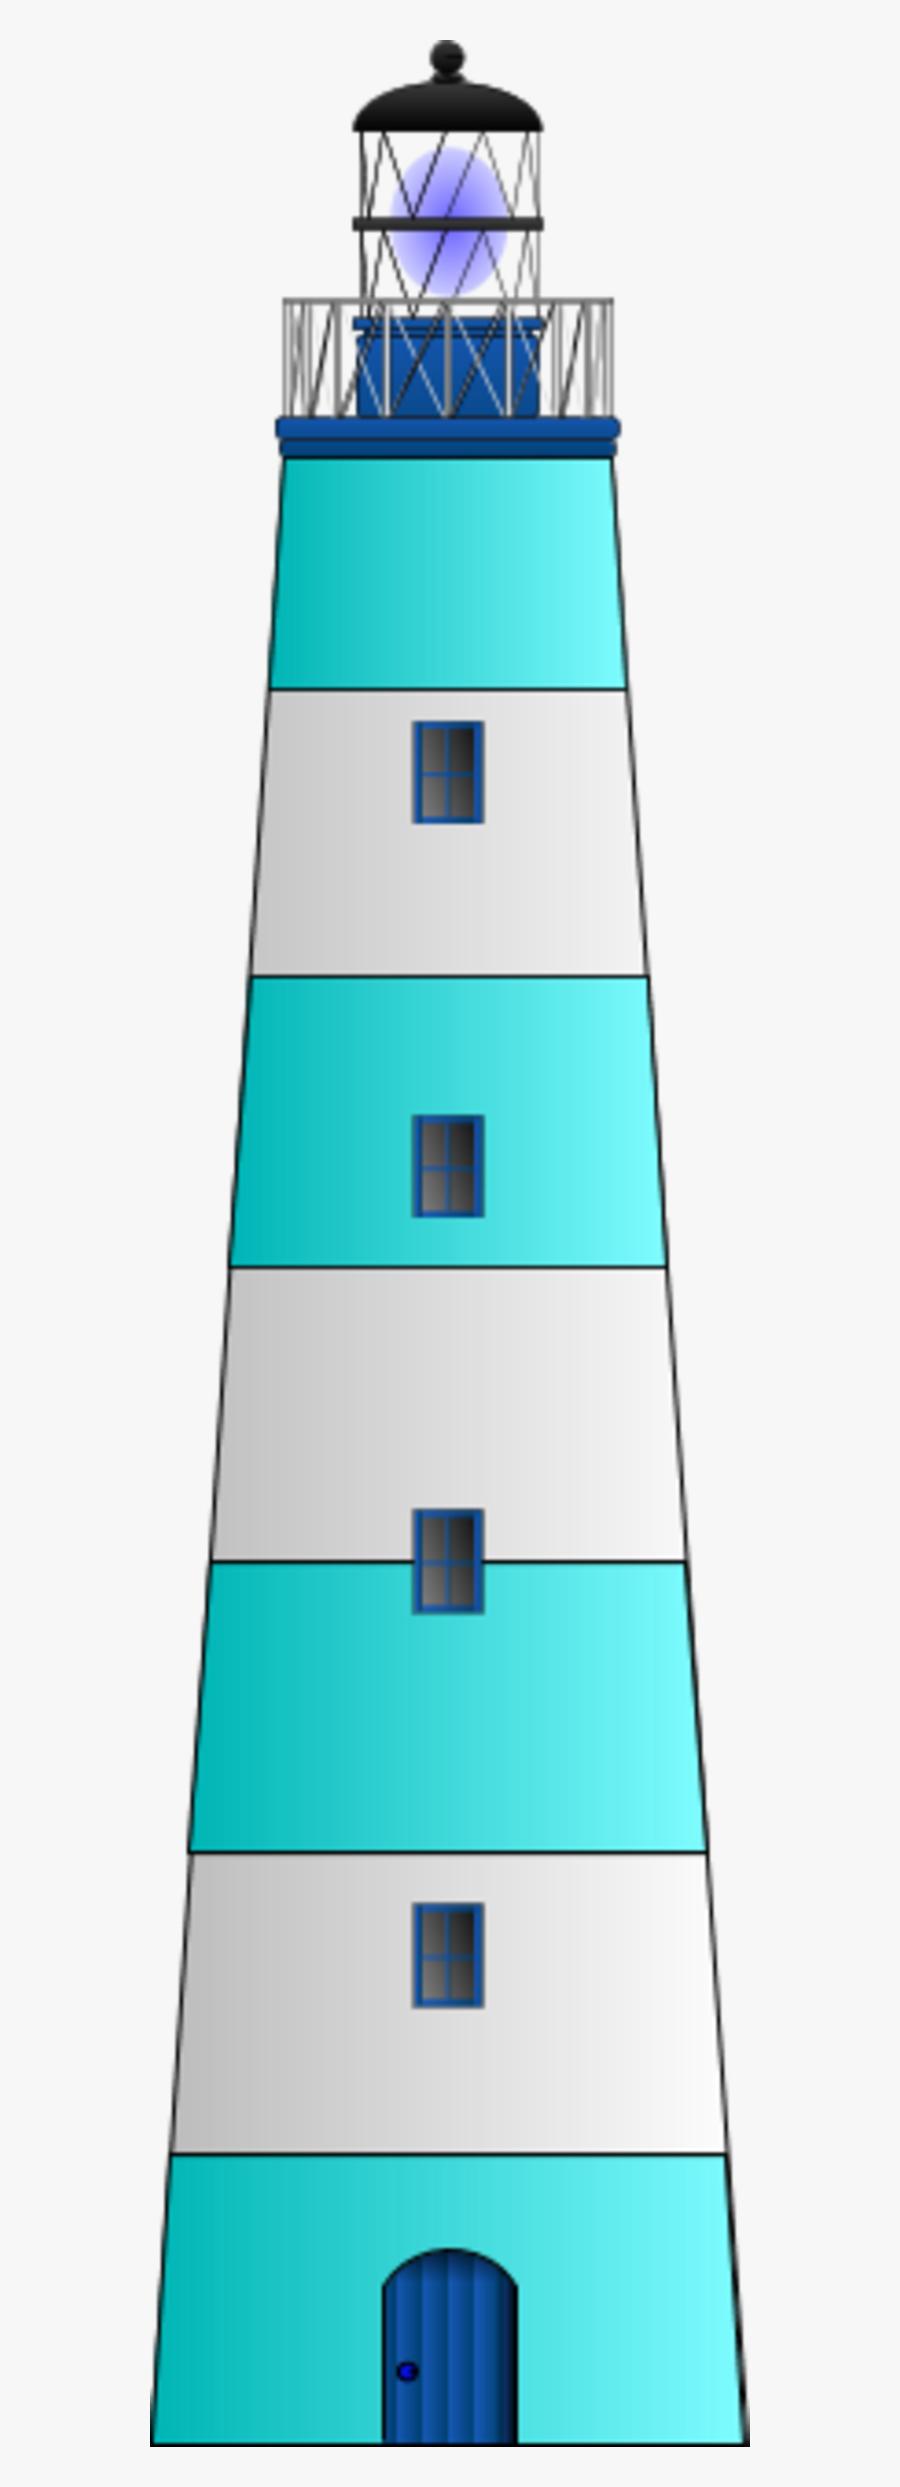 Building Clipart Blue Lighthouse Clipart Gallery ~ - Cartoon Blue Lighthouse, Transparent Clipart